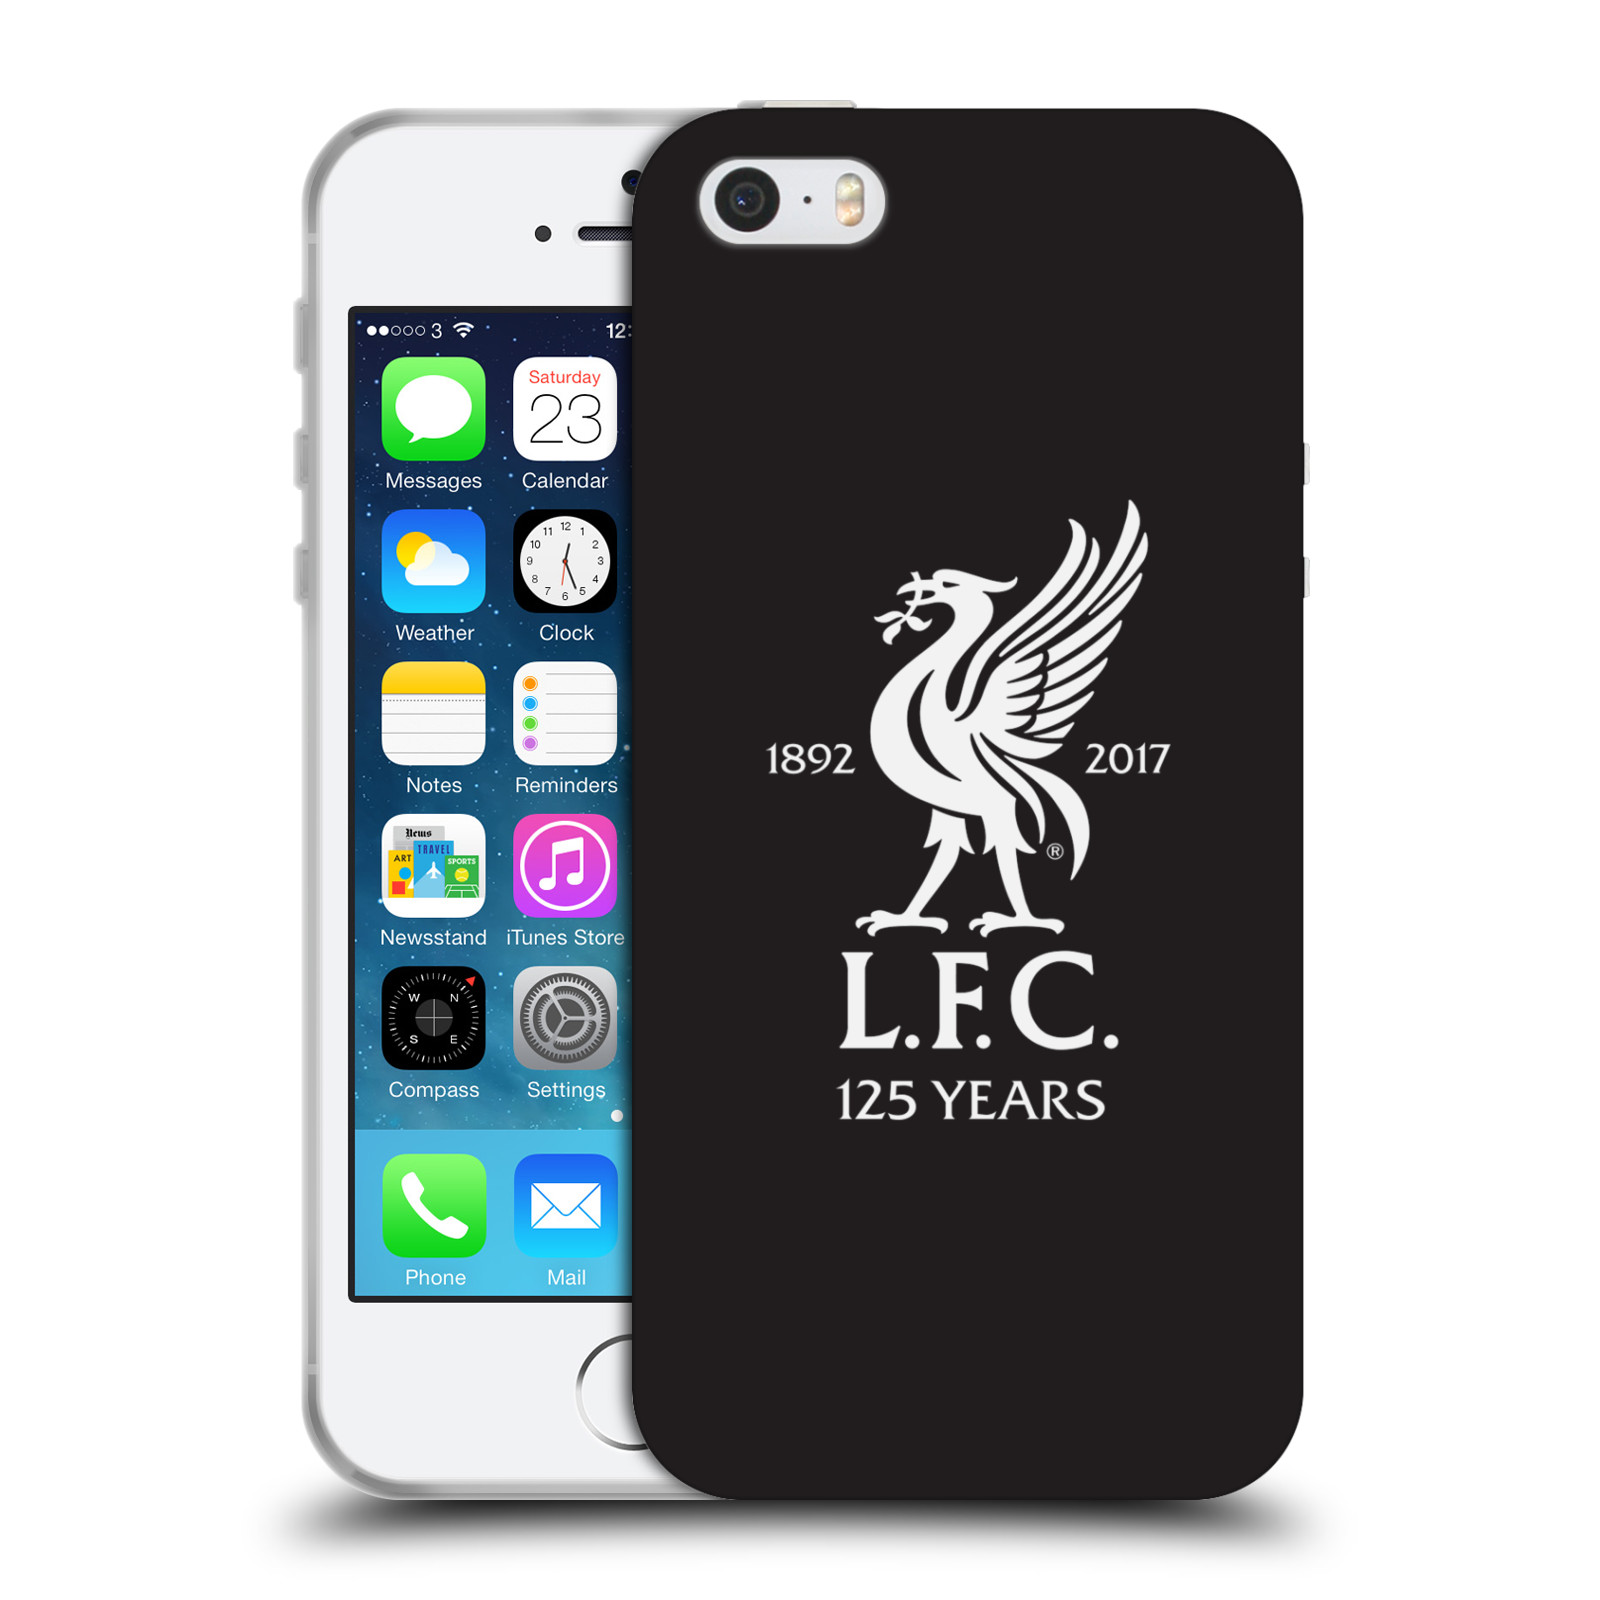 HEAD CASE silikonový obal na mobil Apple Iphone 5 5S Fotbalový klub  Liverpool fotbalový dres empty b81eca3873a